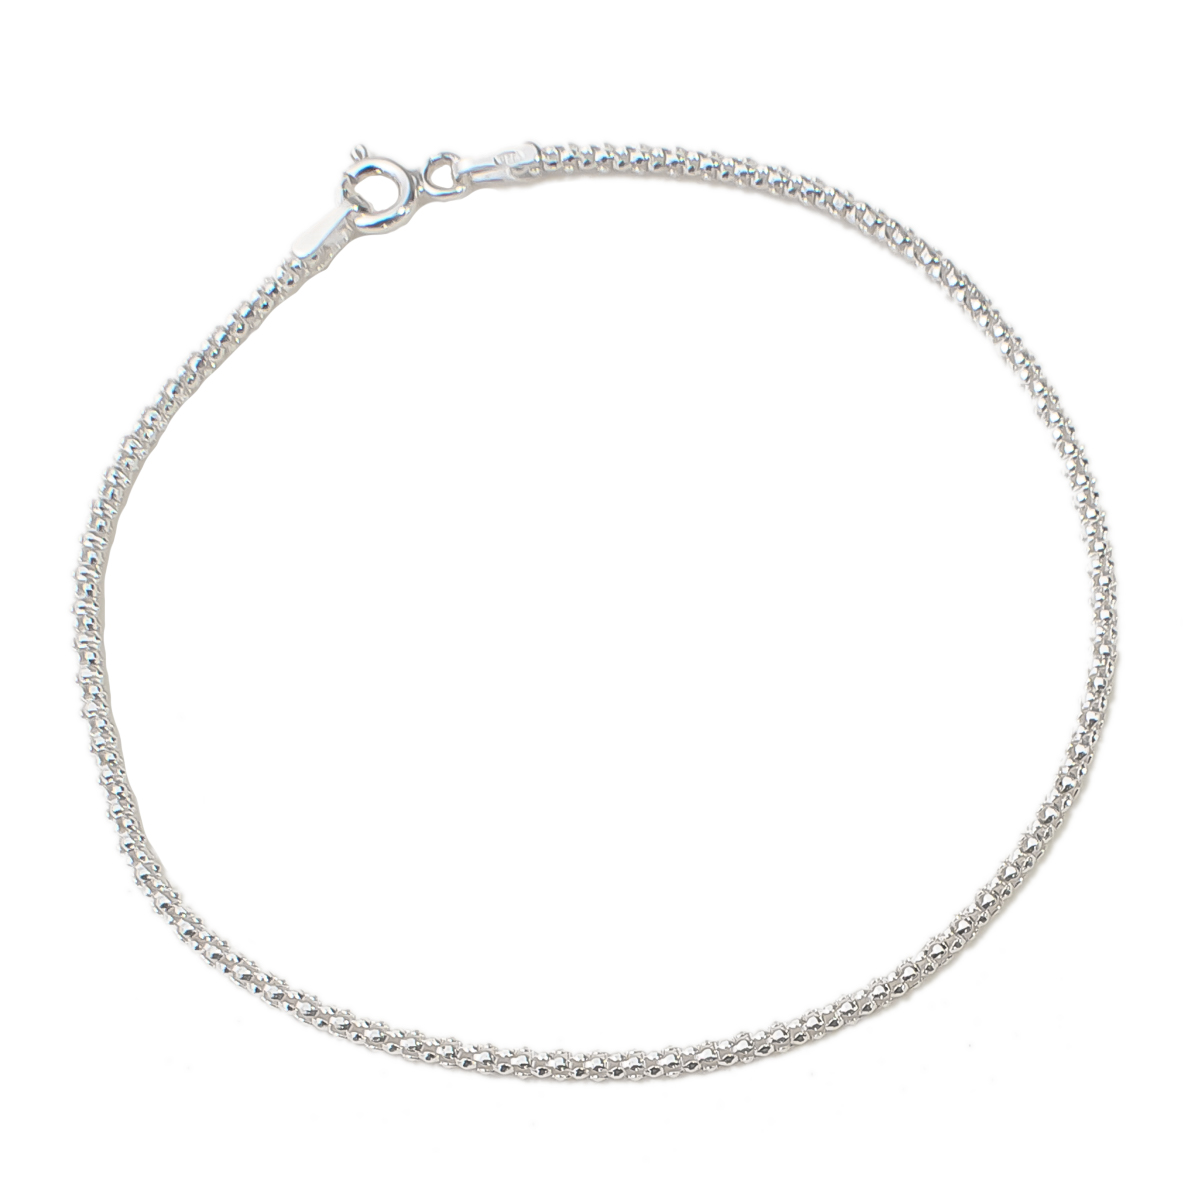 Pulseira Feminina Delicada 18 cm - Prata 925